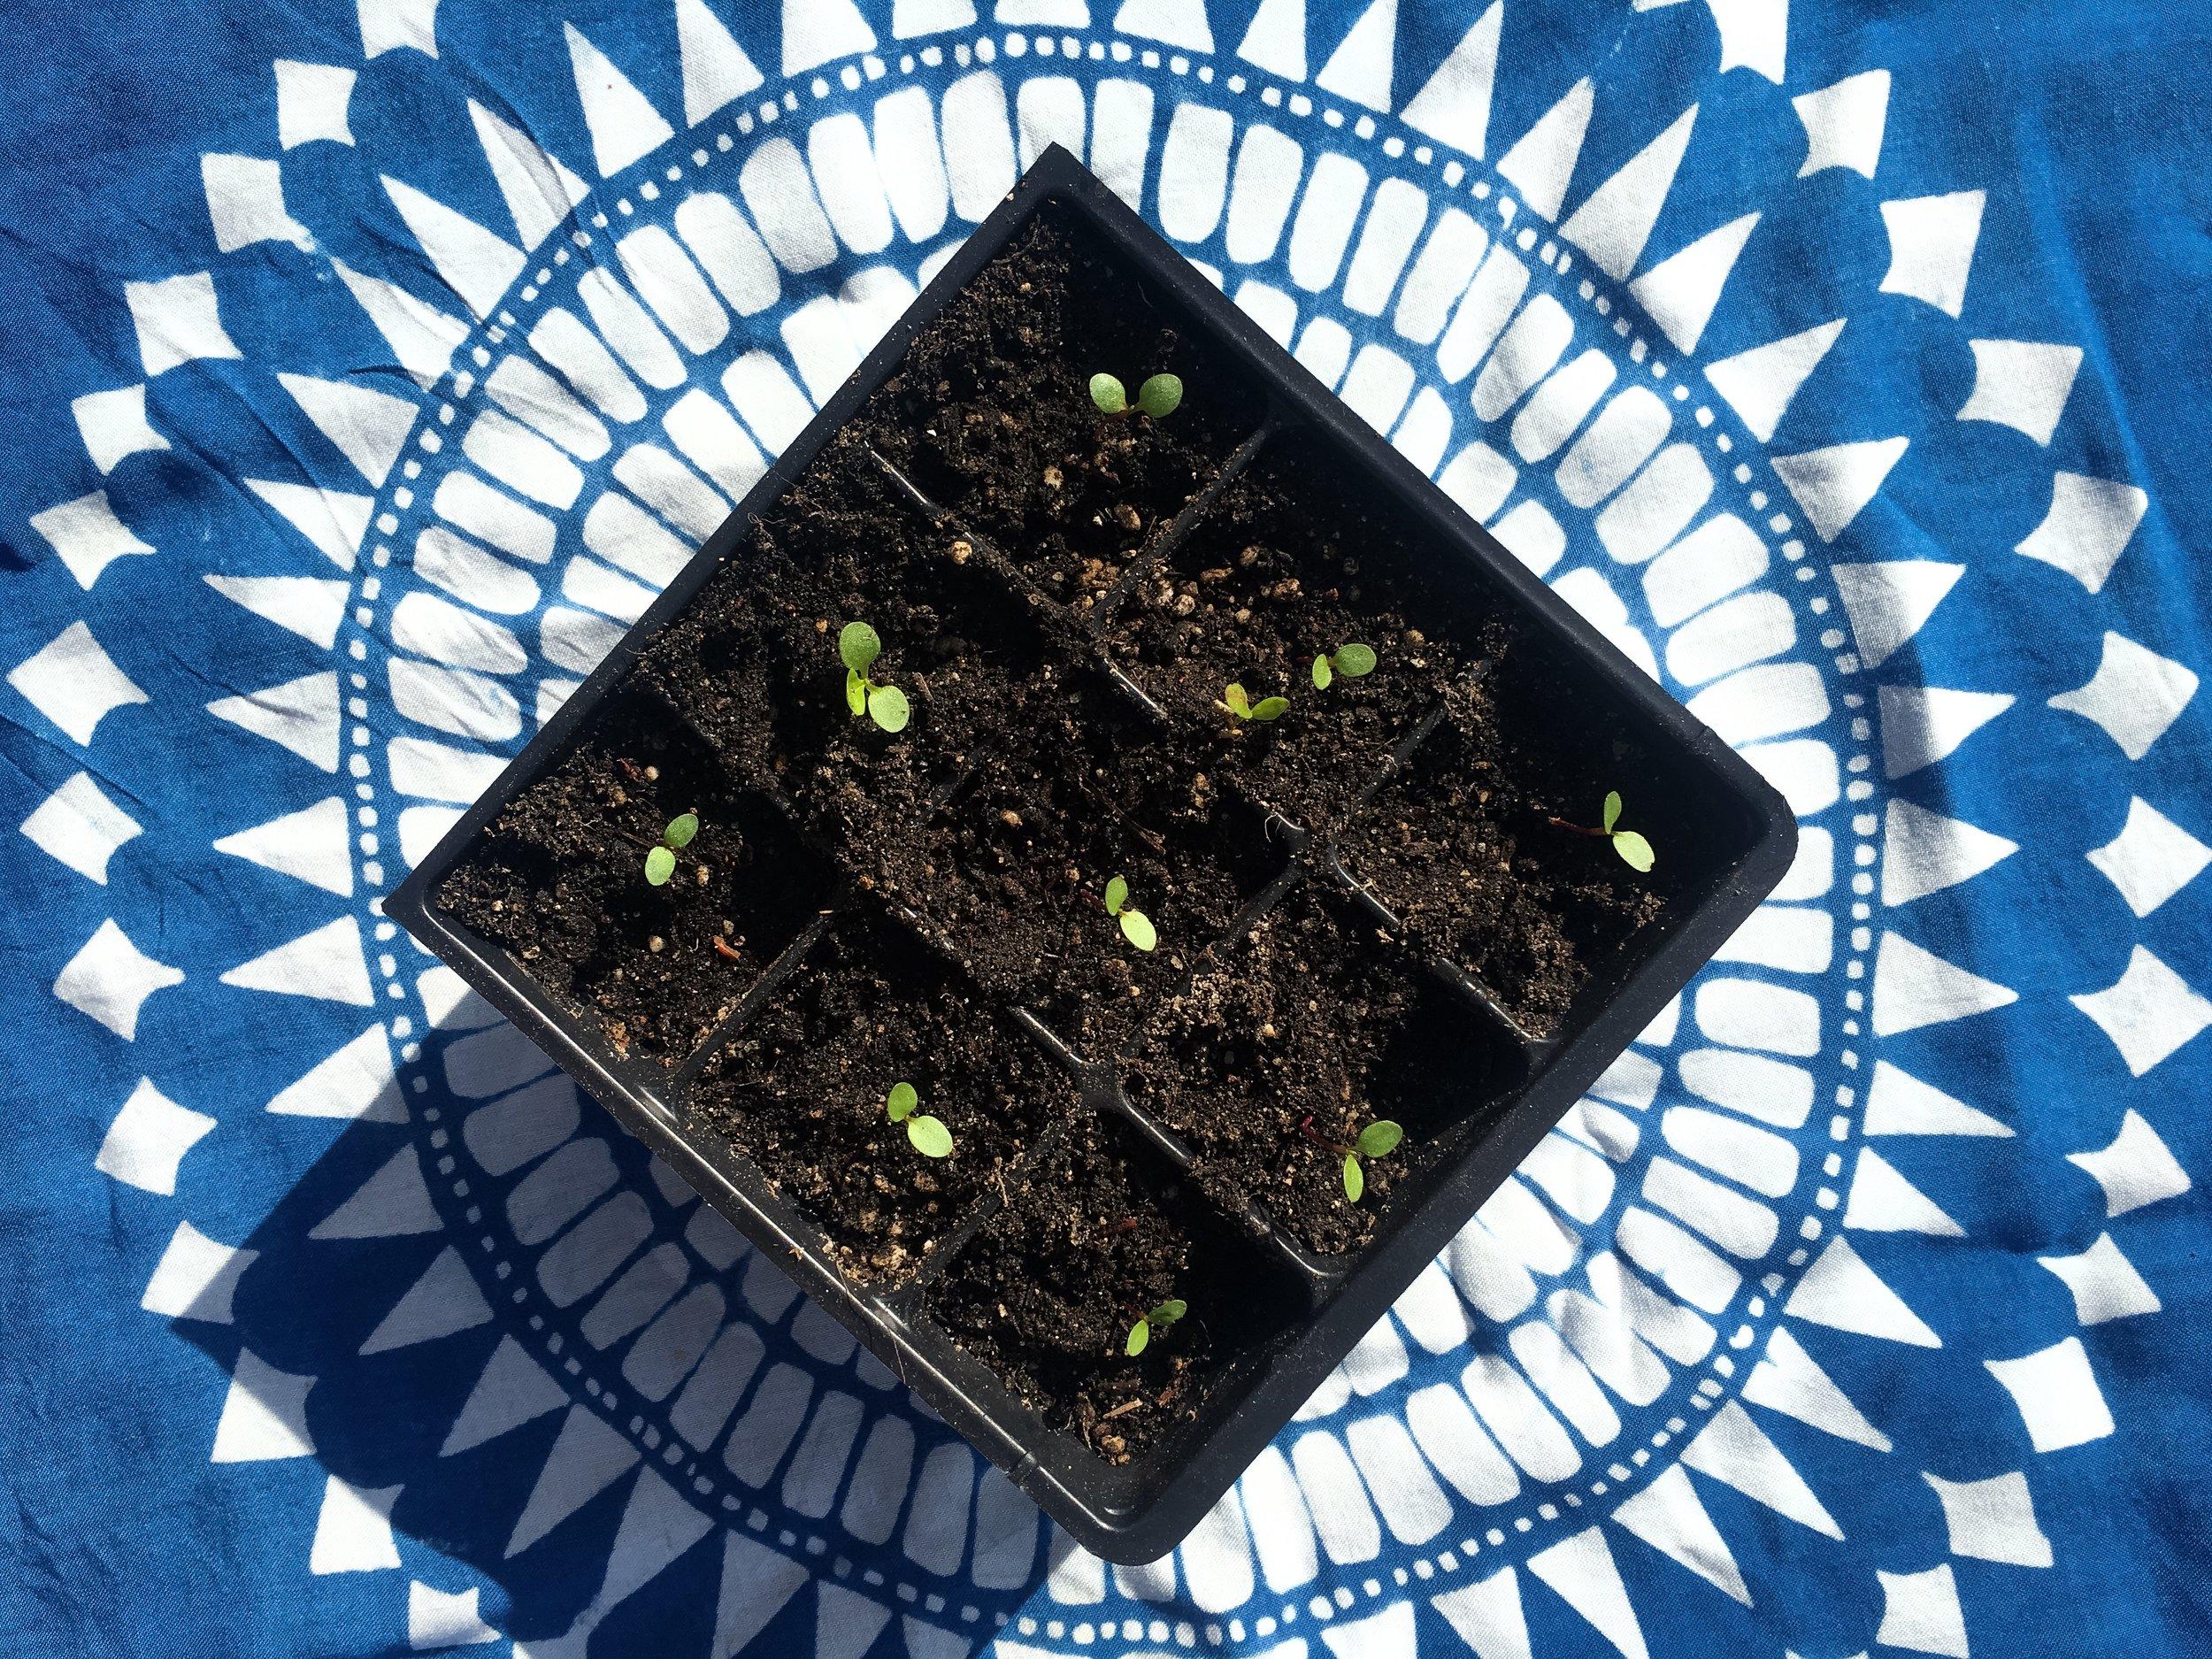 Graham Keegan Persicaria Tinctoria Indigo Plant Growing Indigrowing.jpg